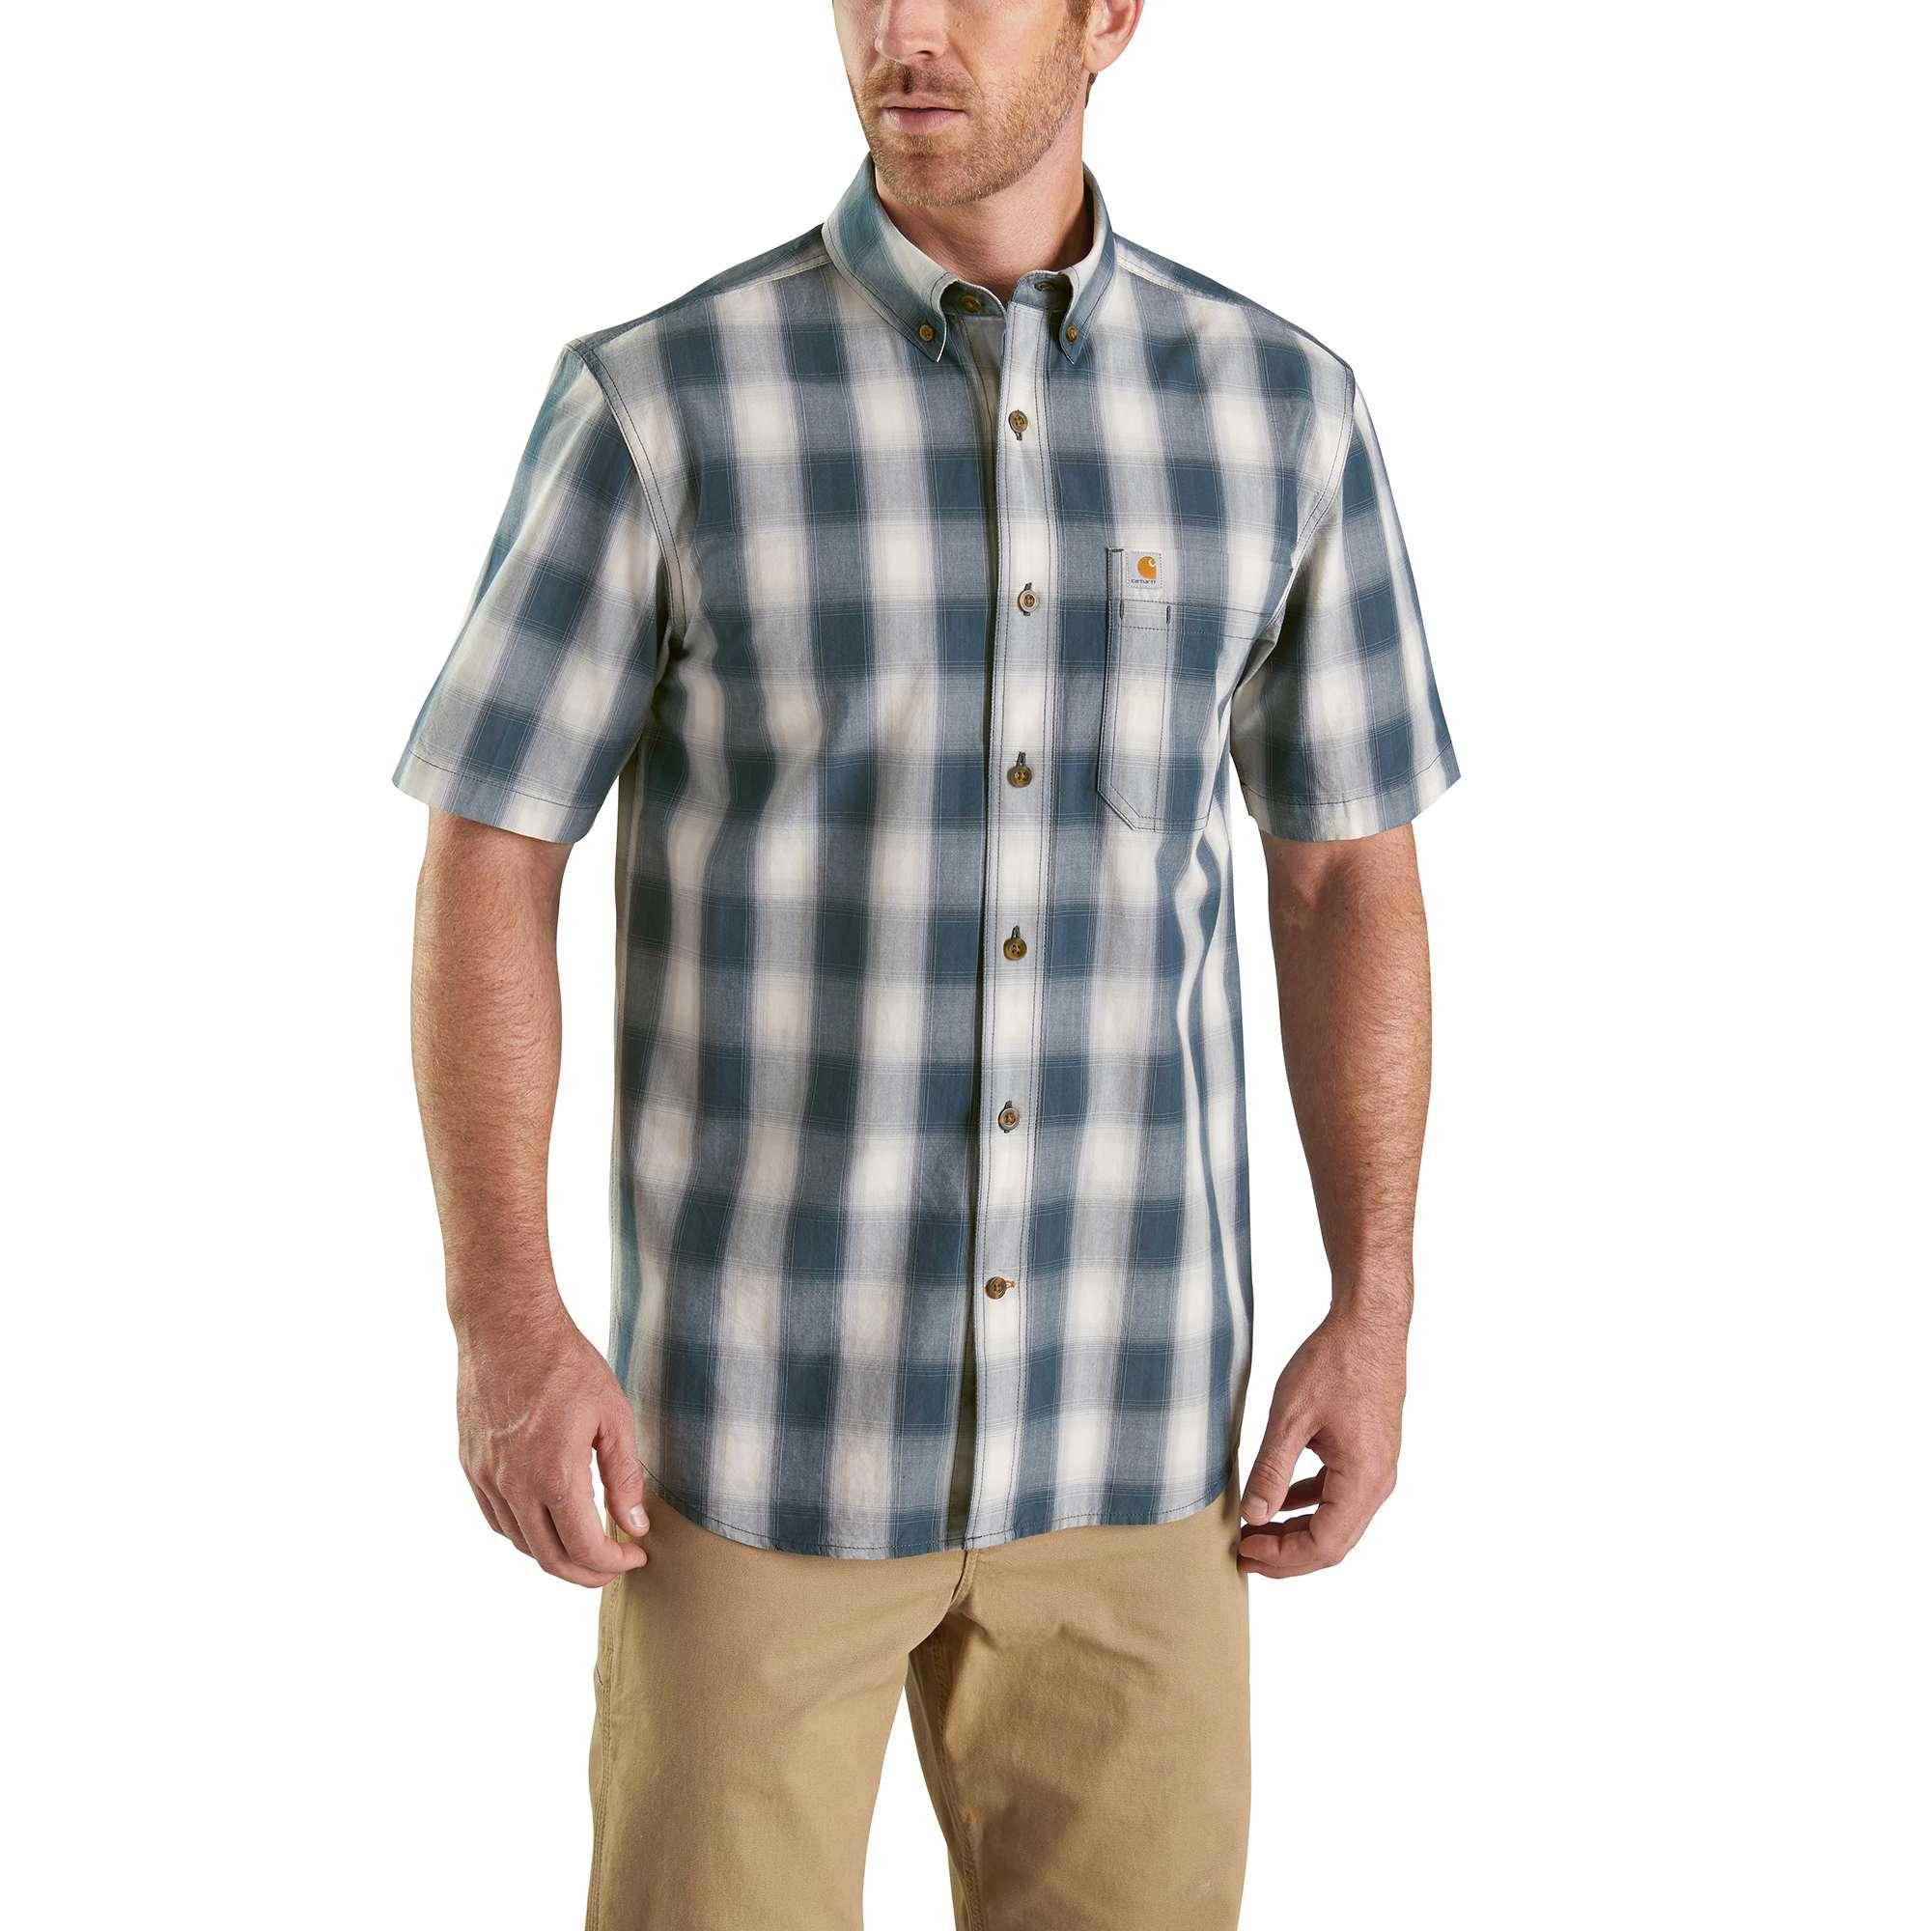 Men's Essential Plaid Button Down Shirt, Navy, swatch